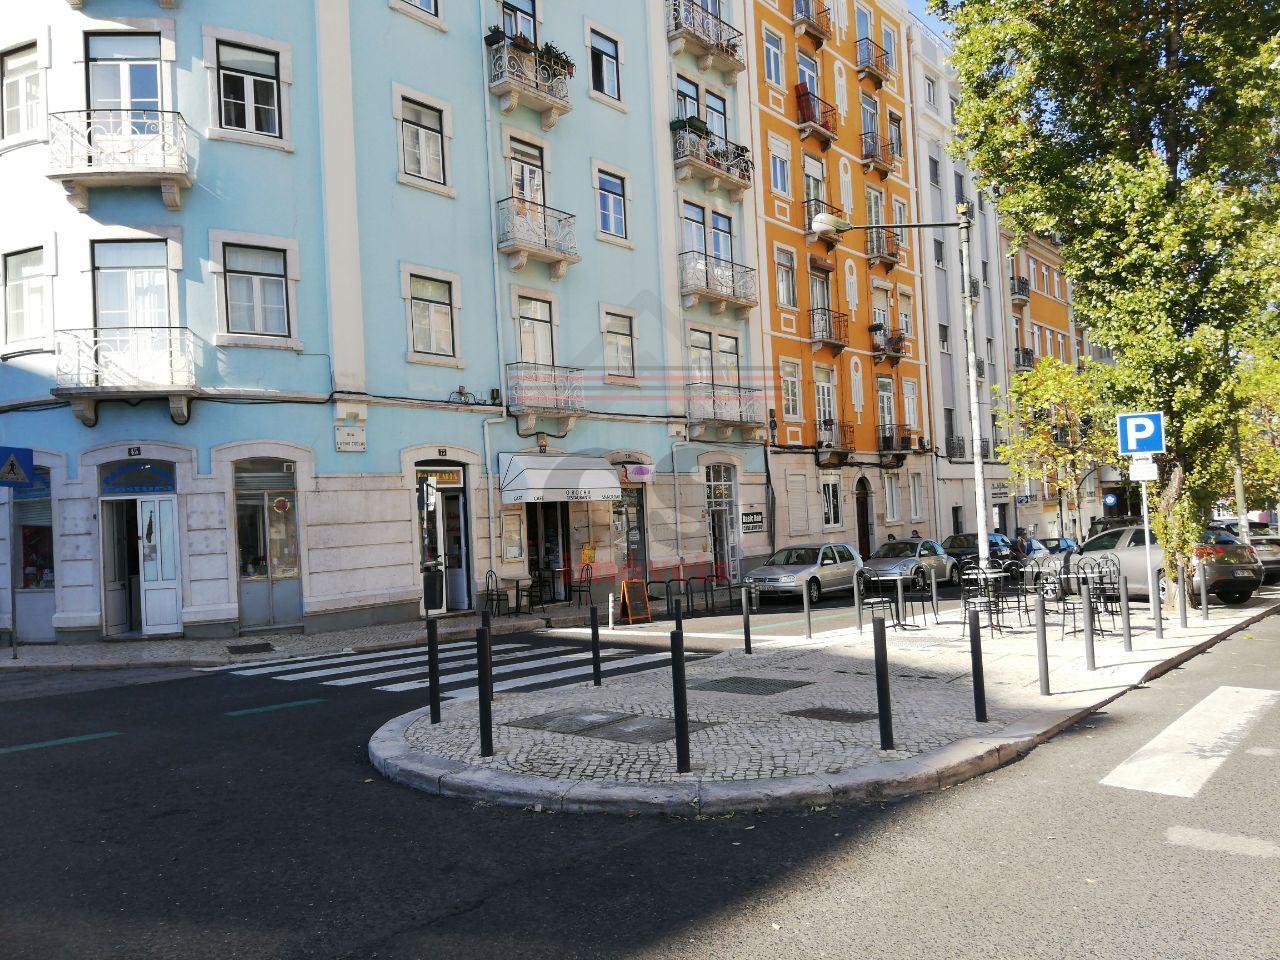 Restaurant   Acheter Avenidas Novas 279.000€